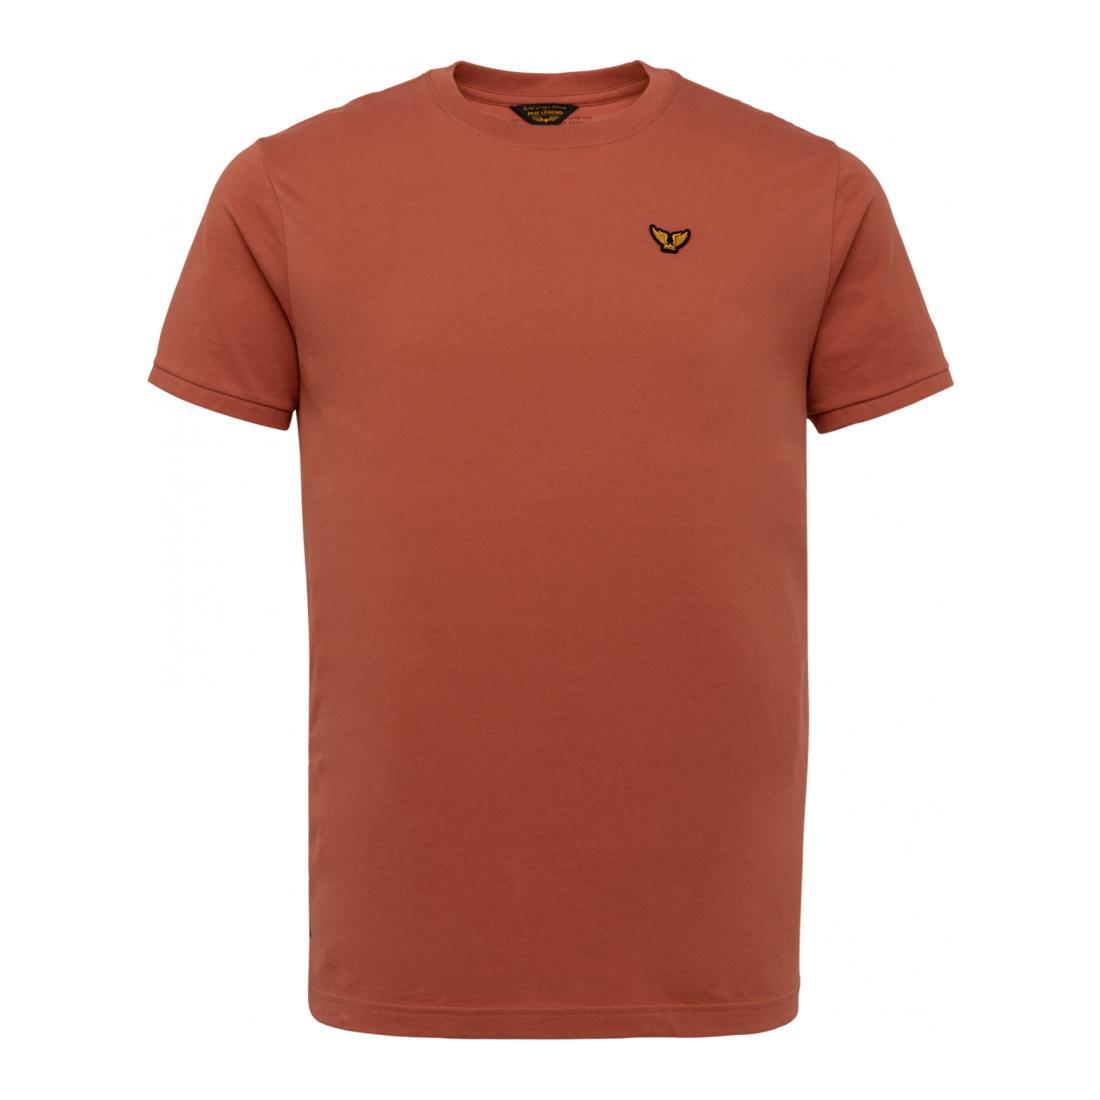 PME Legend T-Shirt Herren Short sleeve r-neck singl